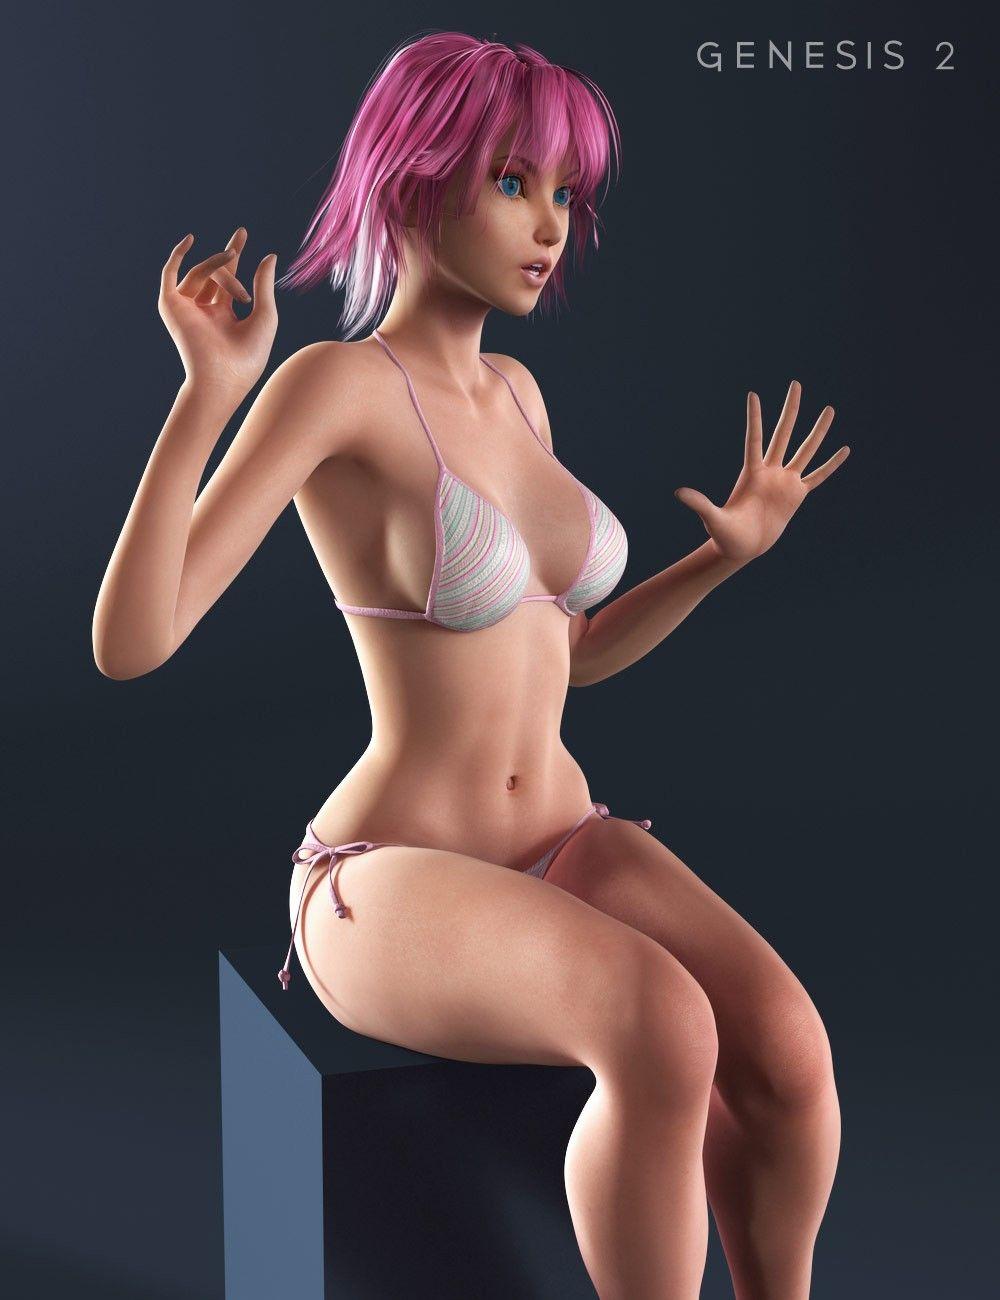 Erotic 3d Anomation